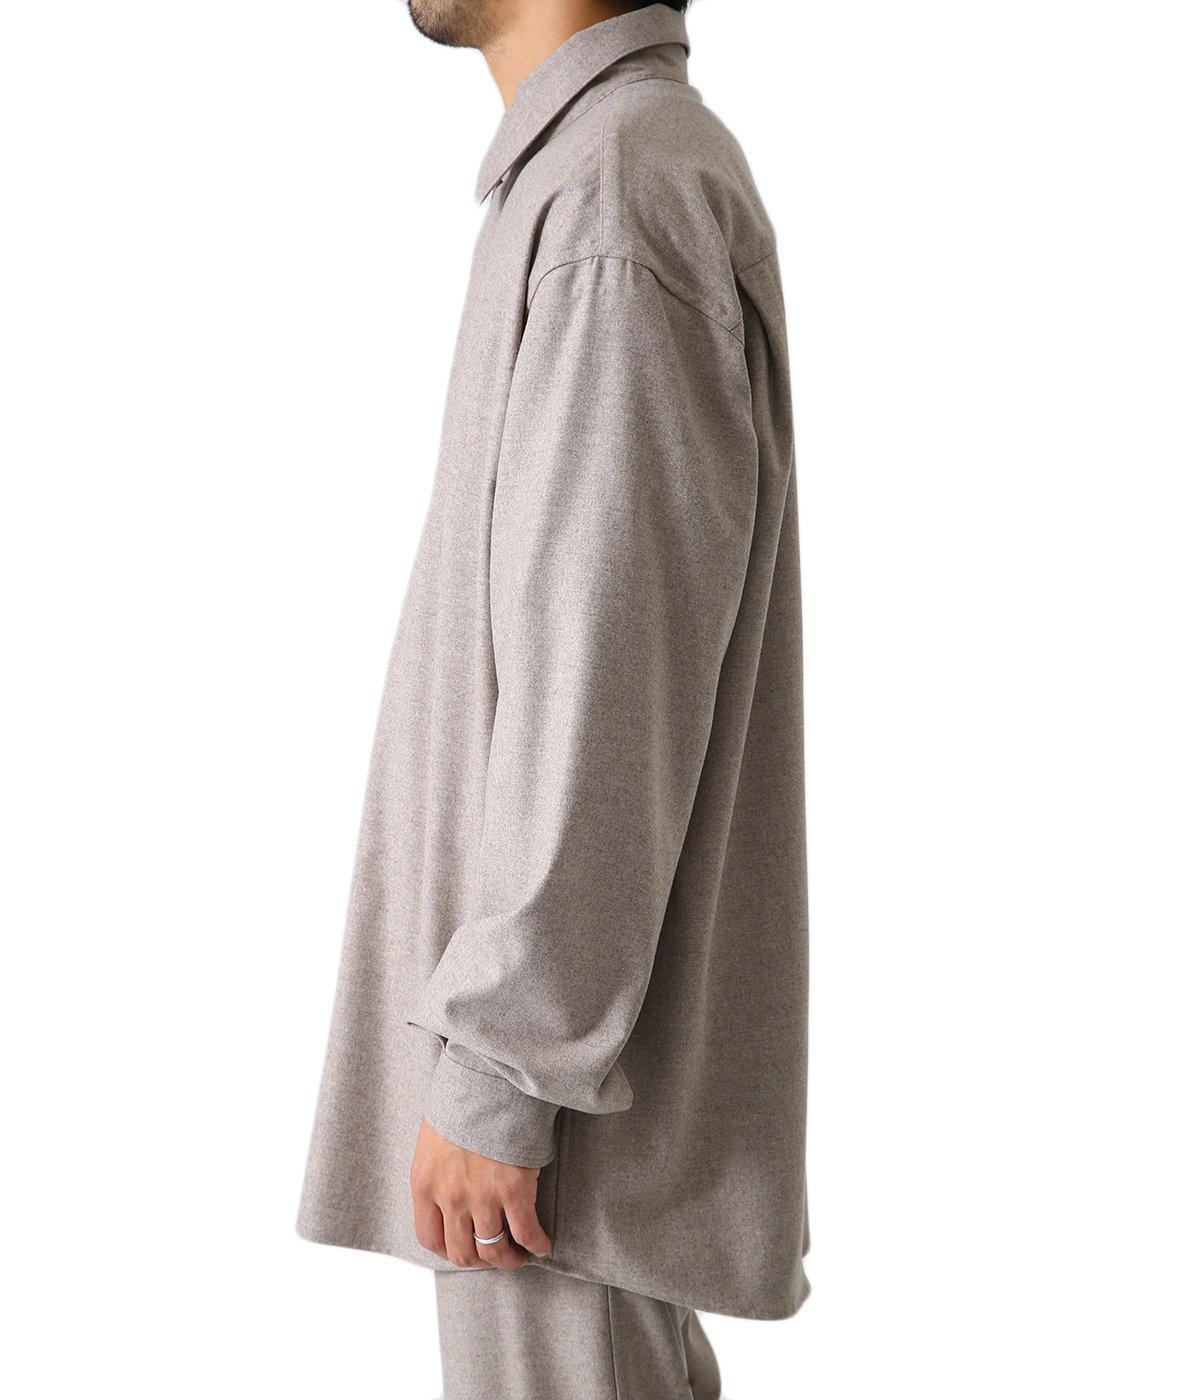 WOOL FULLING FLANNEL CLOTH SHIRTS